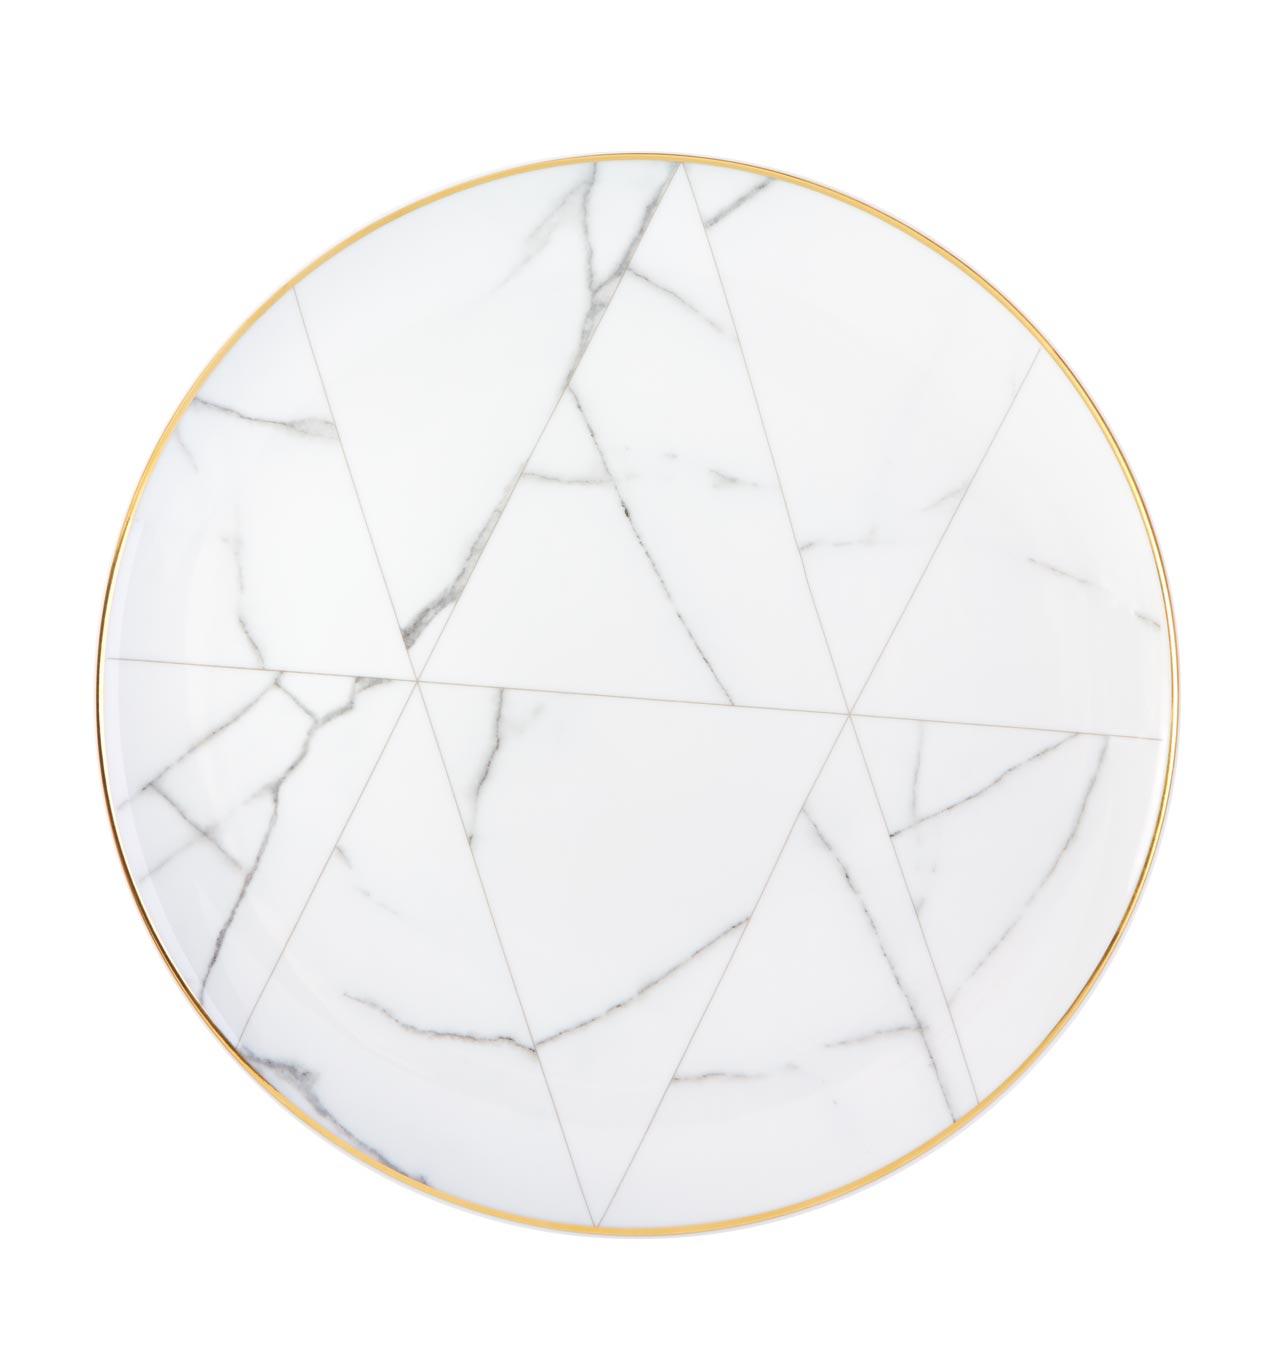 Prato Raso Carrara